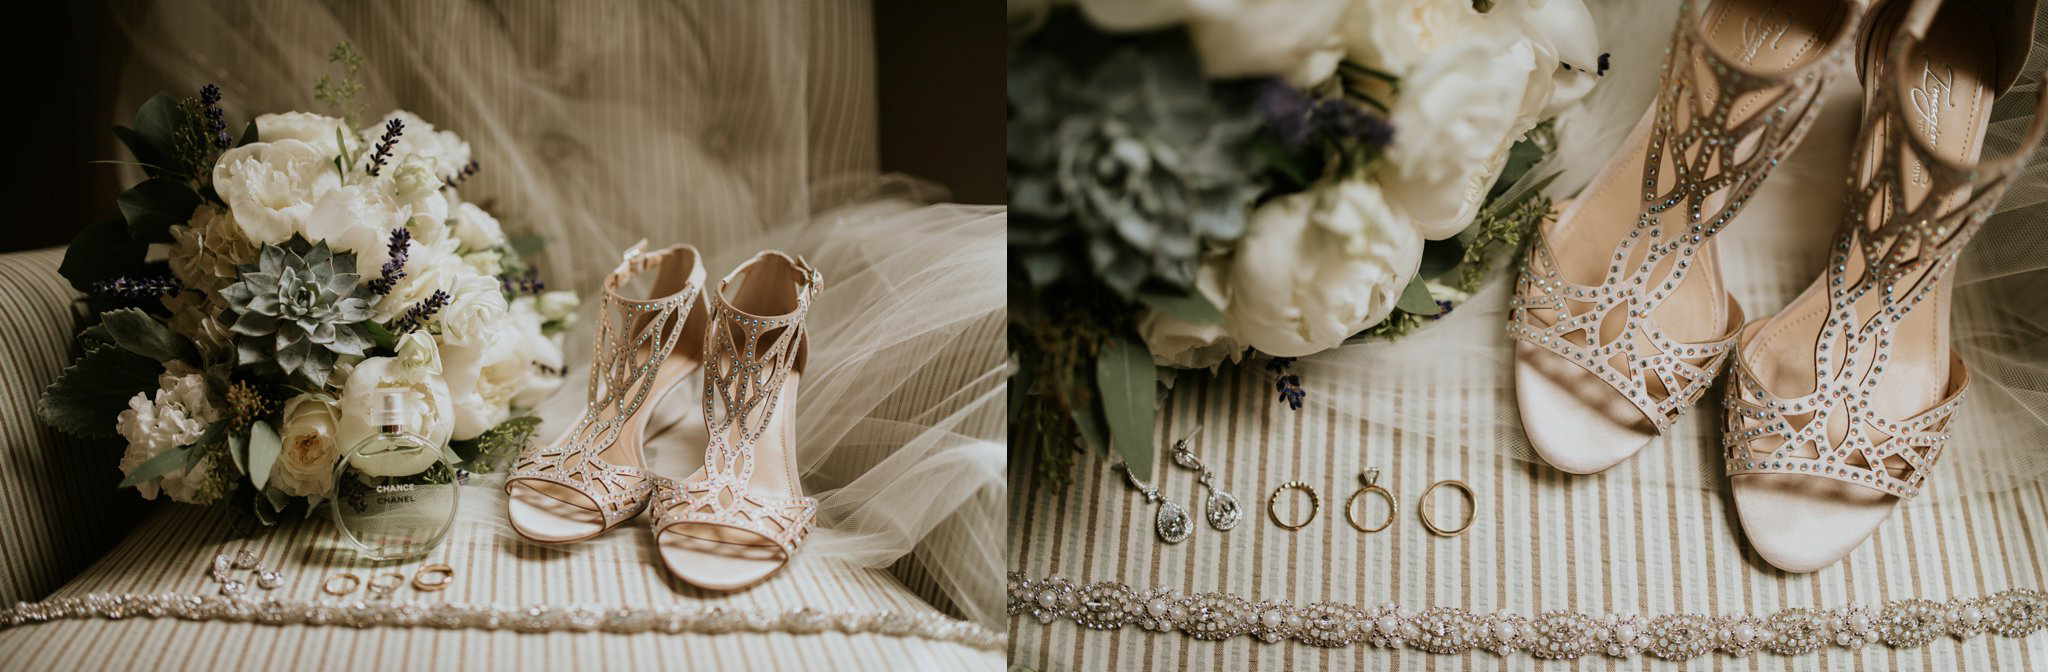 hollywood-school-house-wedding-seattle-photographer-caitlyn-nikula-8.jpg